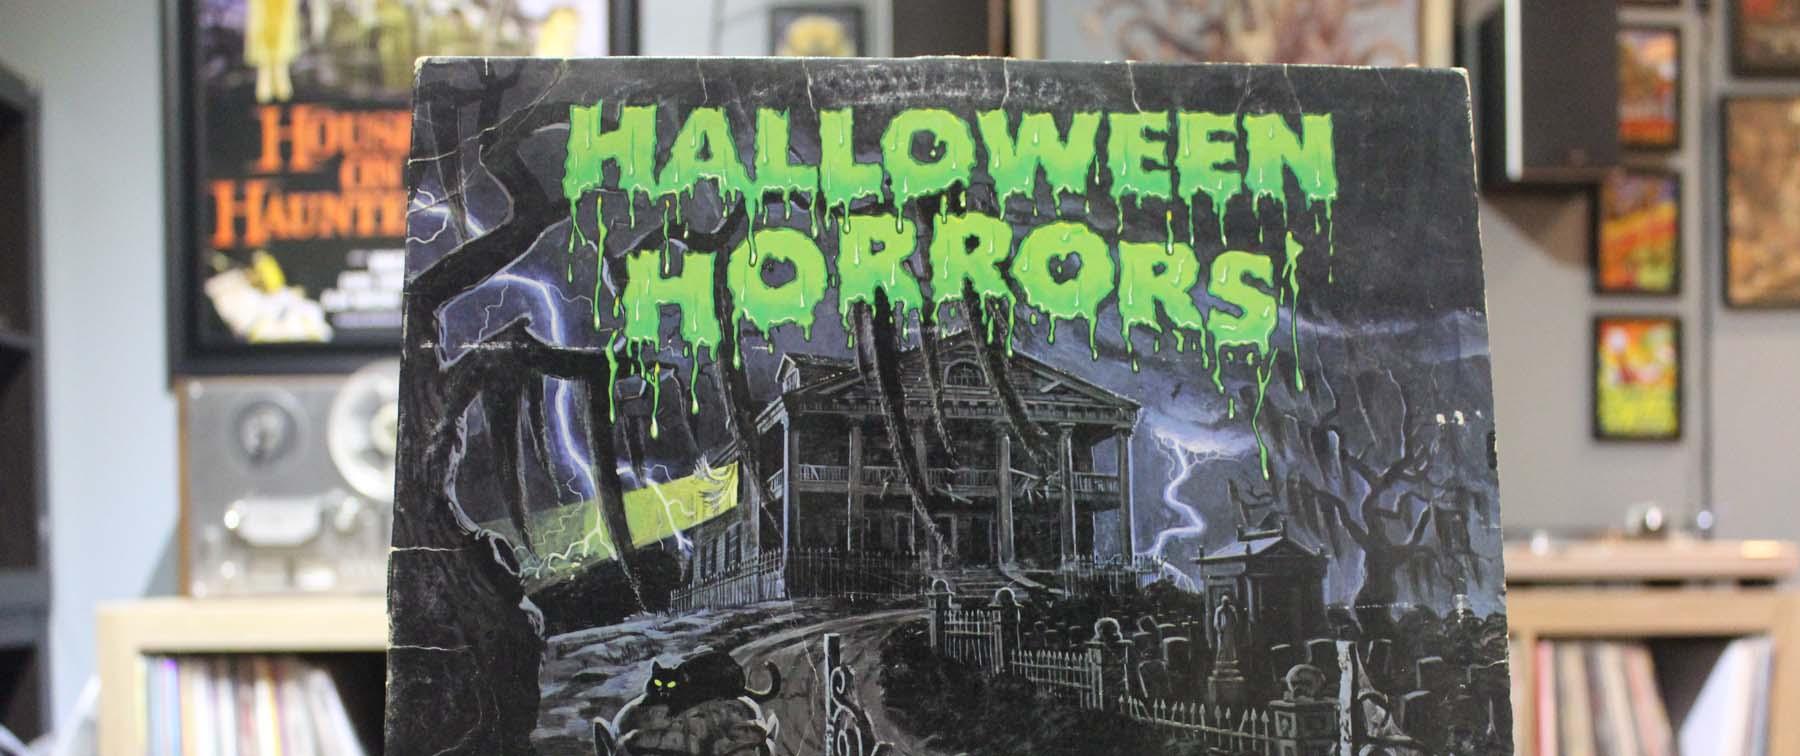 spooky vinyl: halloween records for kids ‹ modern vinyl